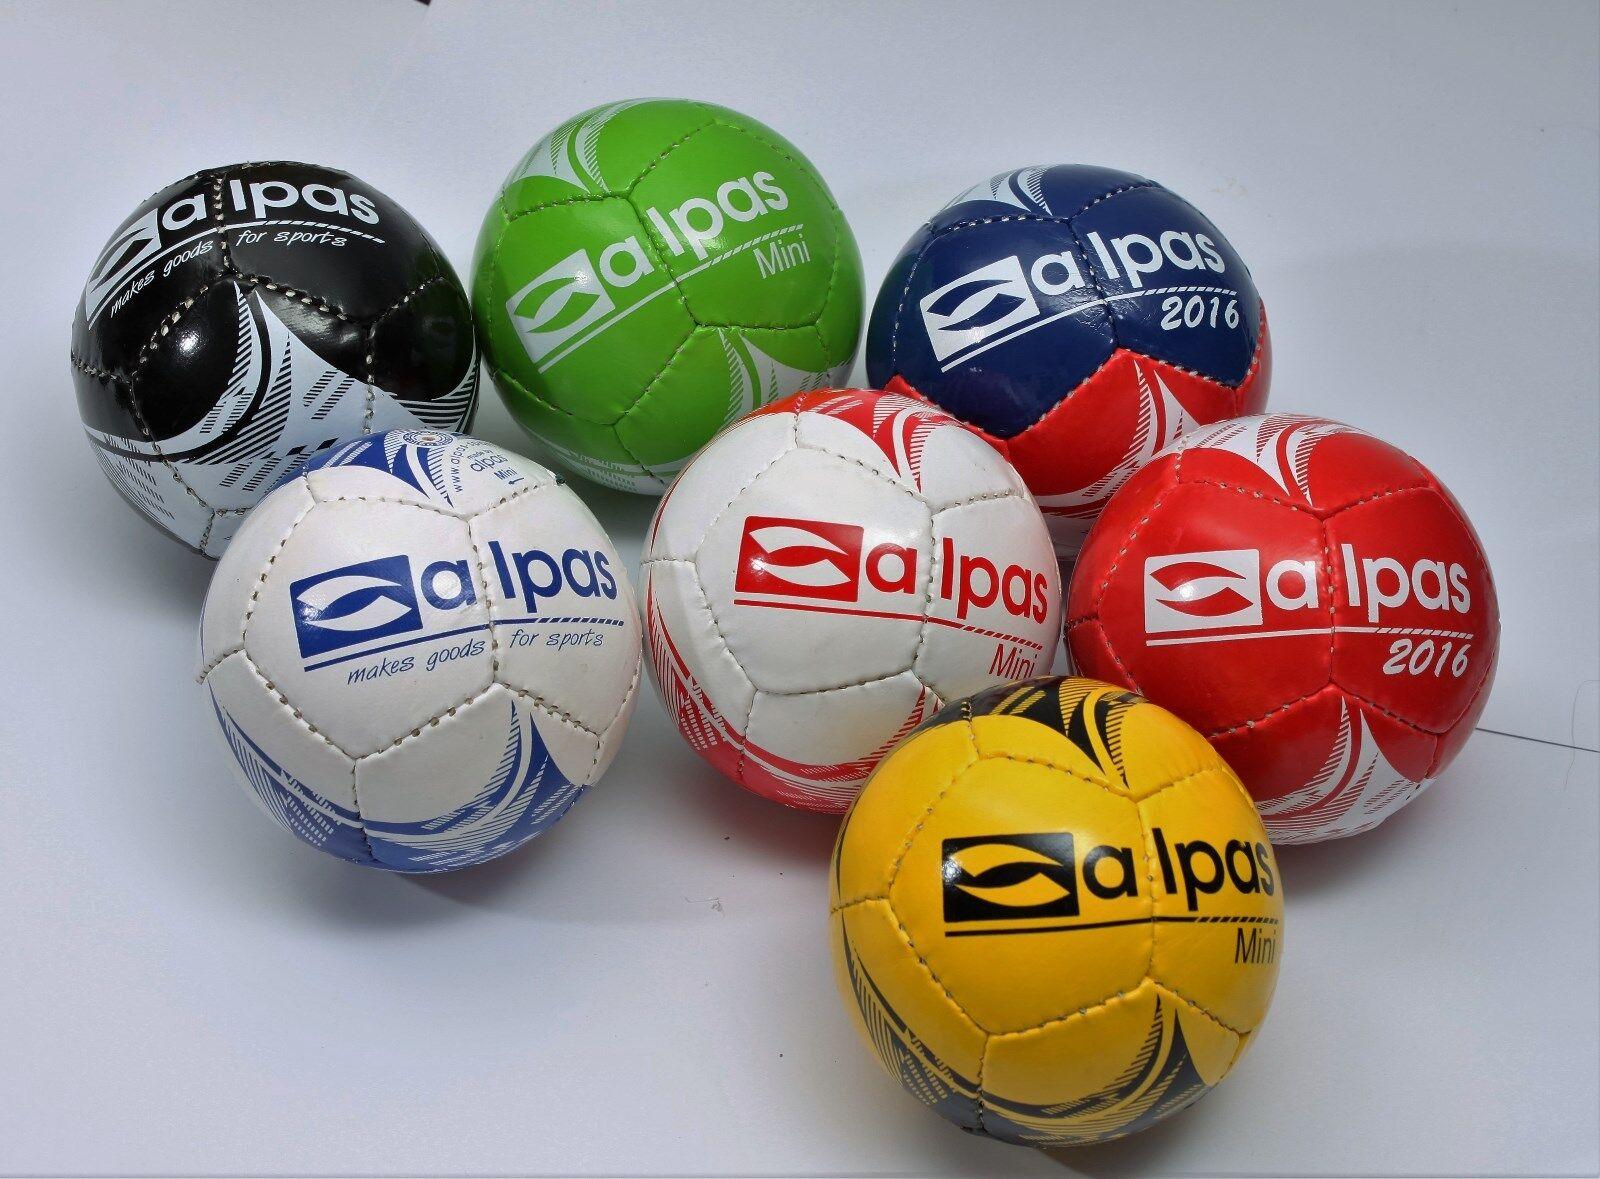 20x Alpas mini-fussbälle mini Ball Ball niños pelota WM em em em d4d0d9